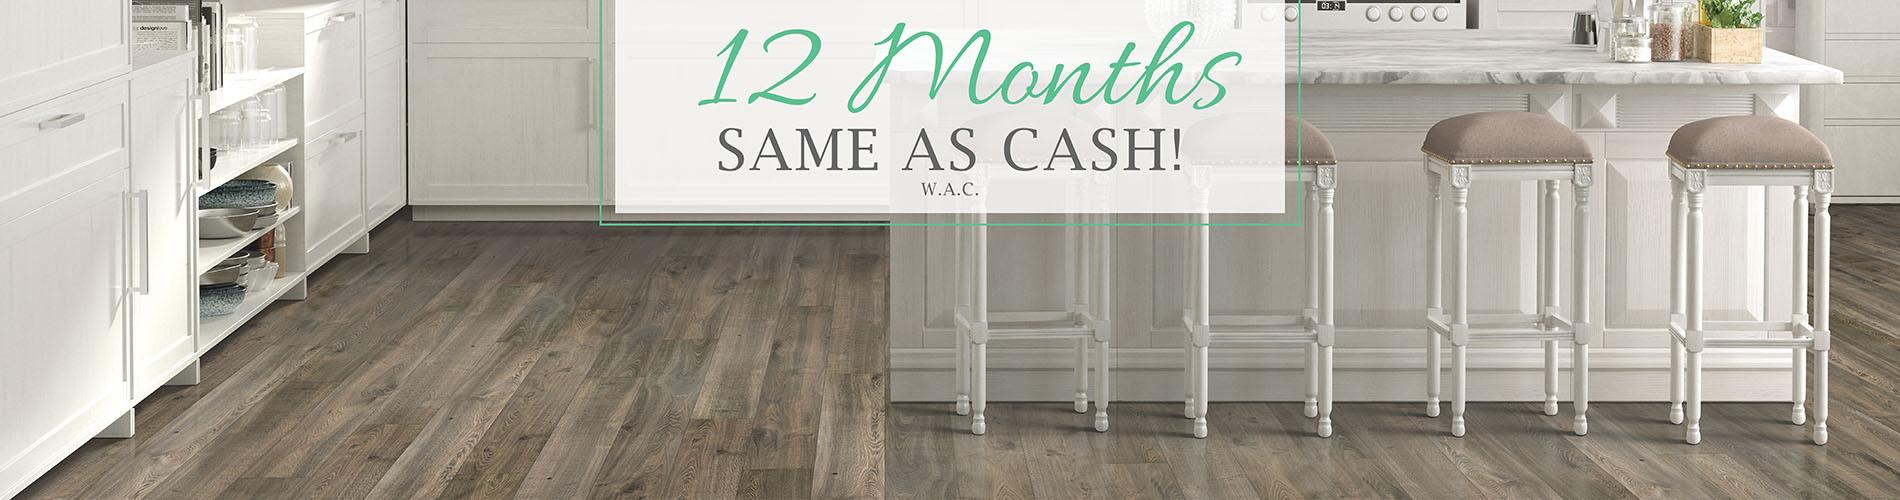 12 Months Same As Cash W.A.C - Flooring USA Abbey Kitchen & Bath Design Center in Stuart, Florida